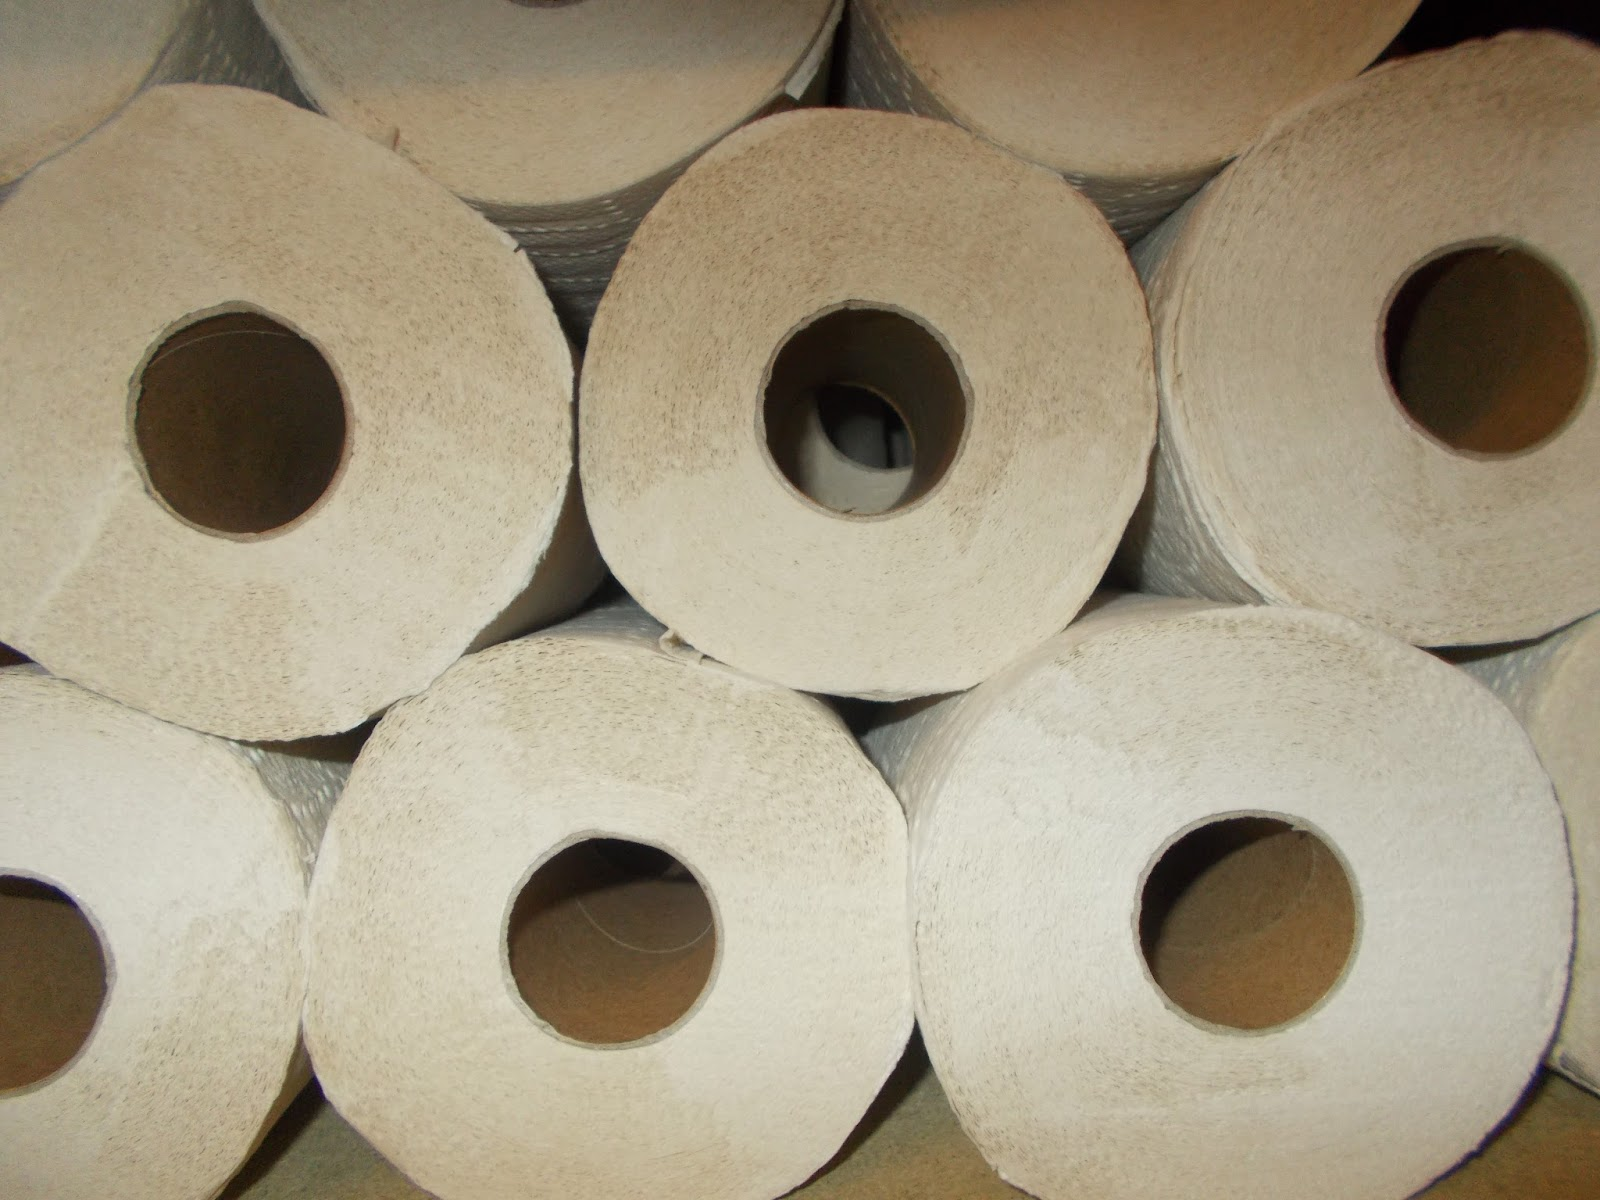 toilettenpapier ohne plastik